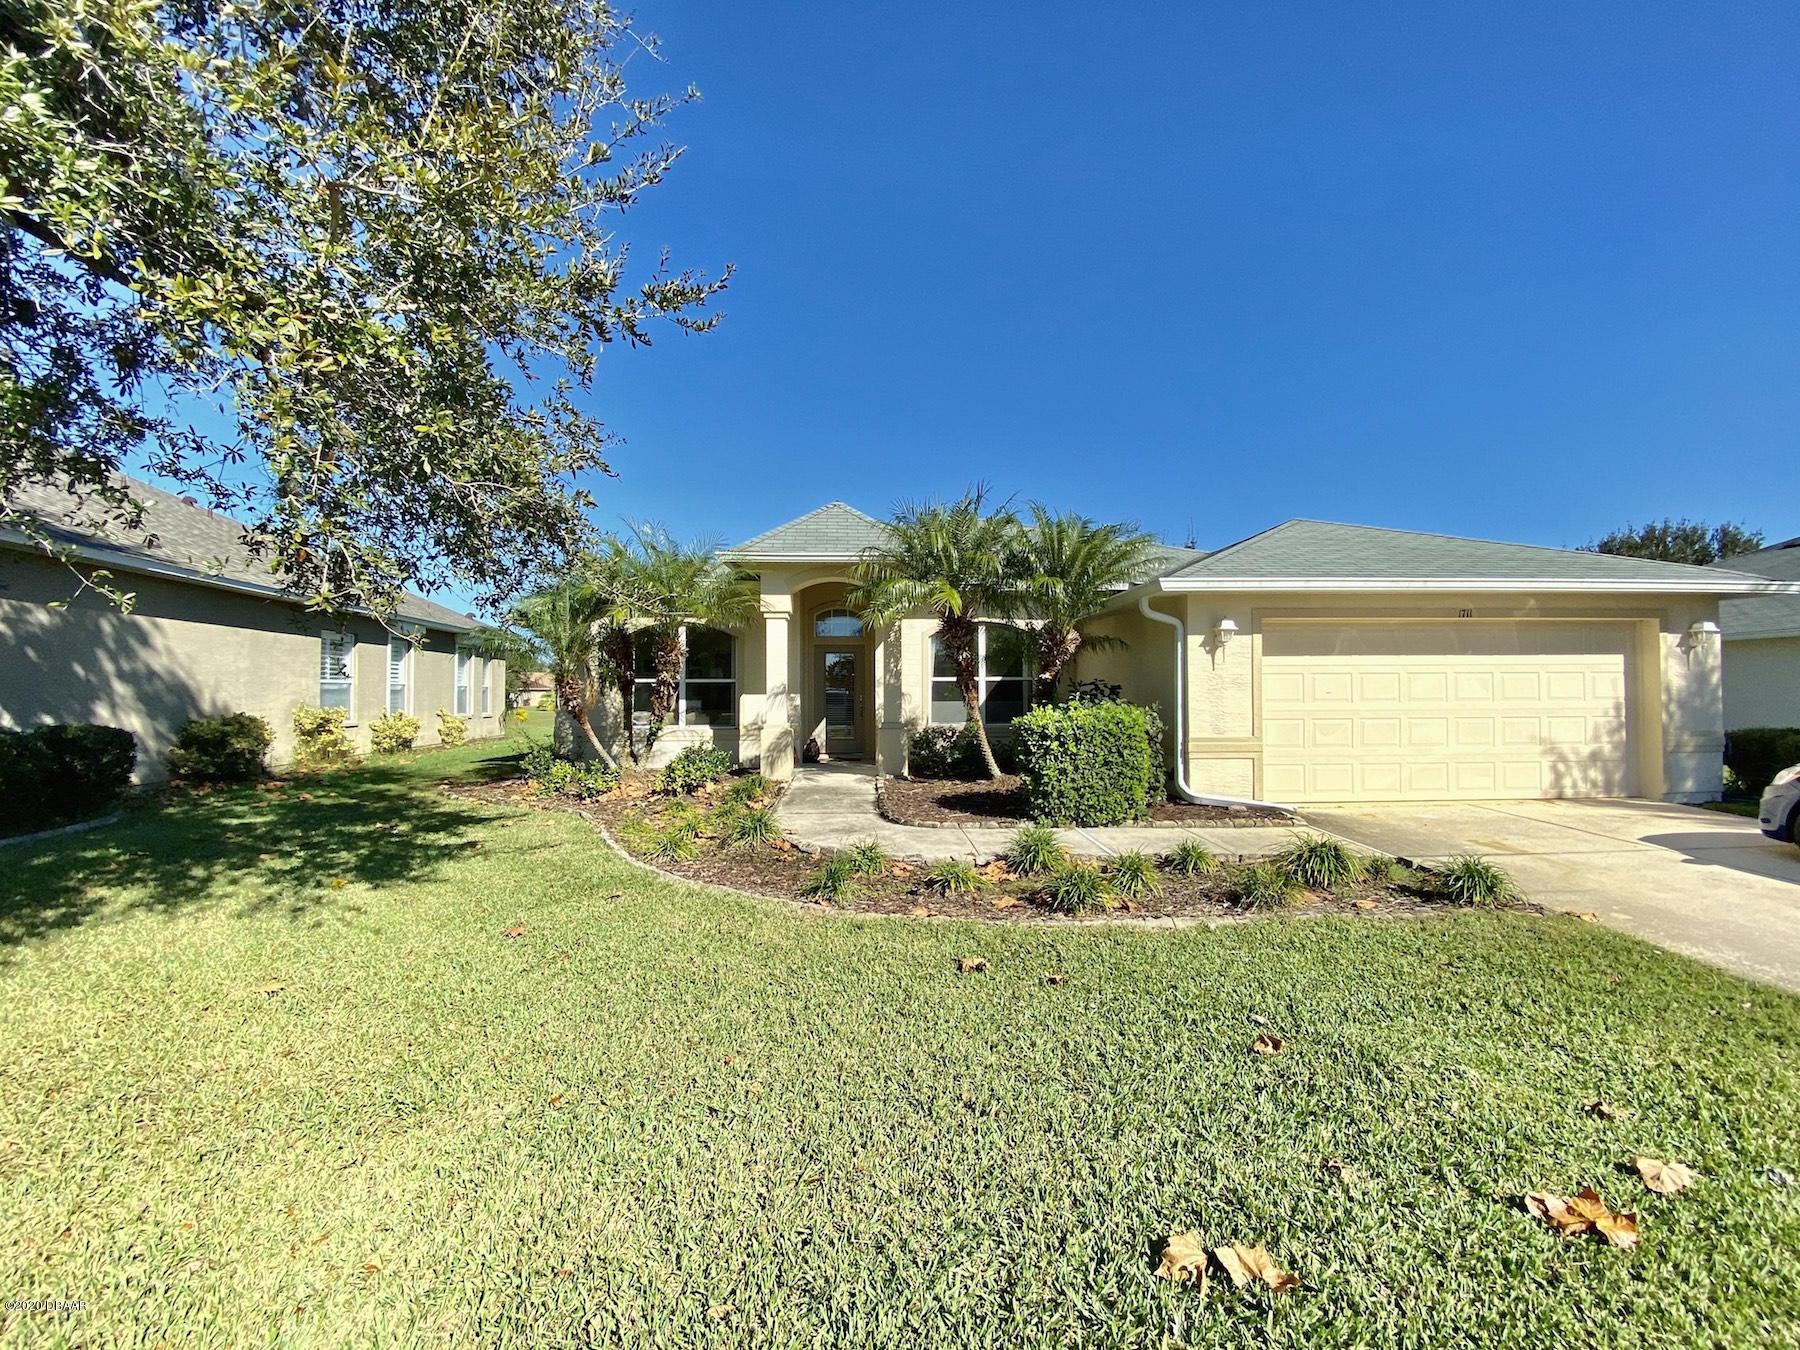 Photo of 1711 Goosecross Court, Port Orange, FL 32128